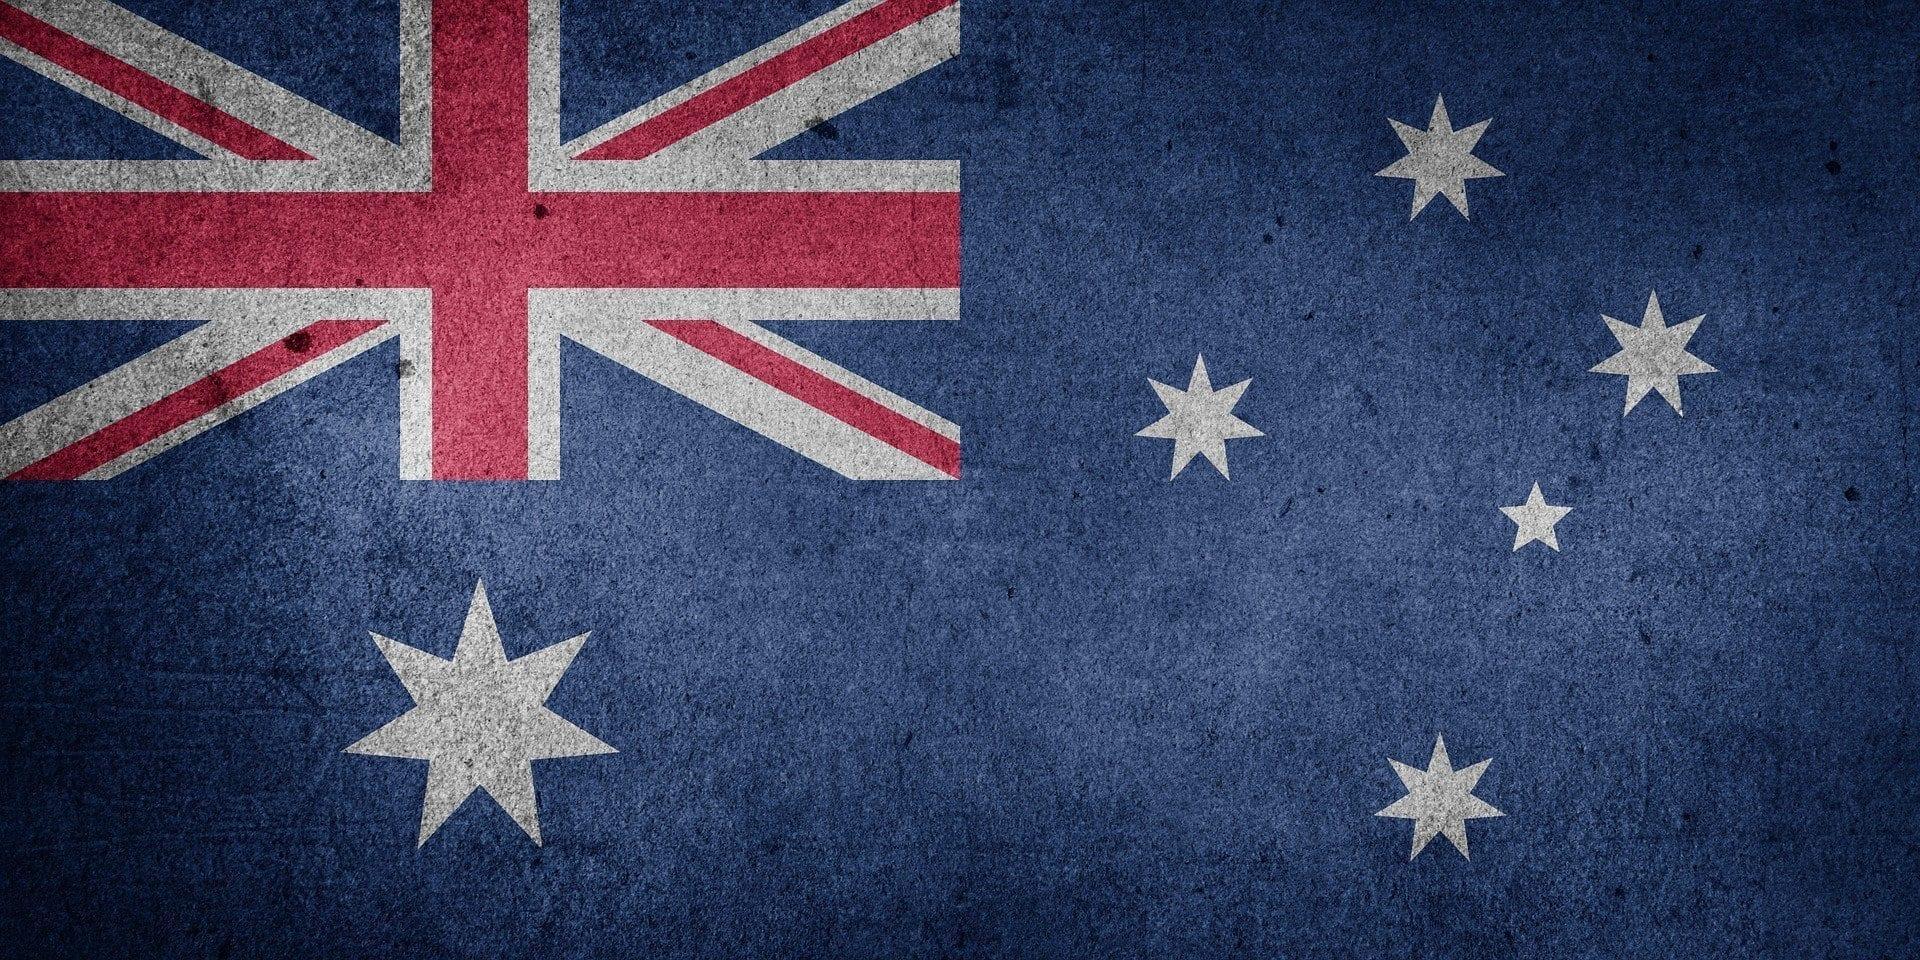 We can provide Australian kickstarter fulfillment. Let us help you get your brand into Australia